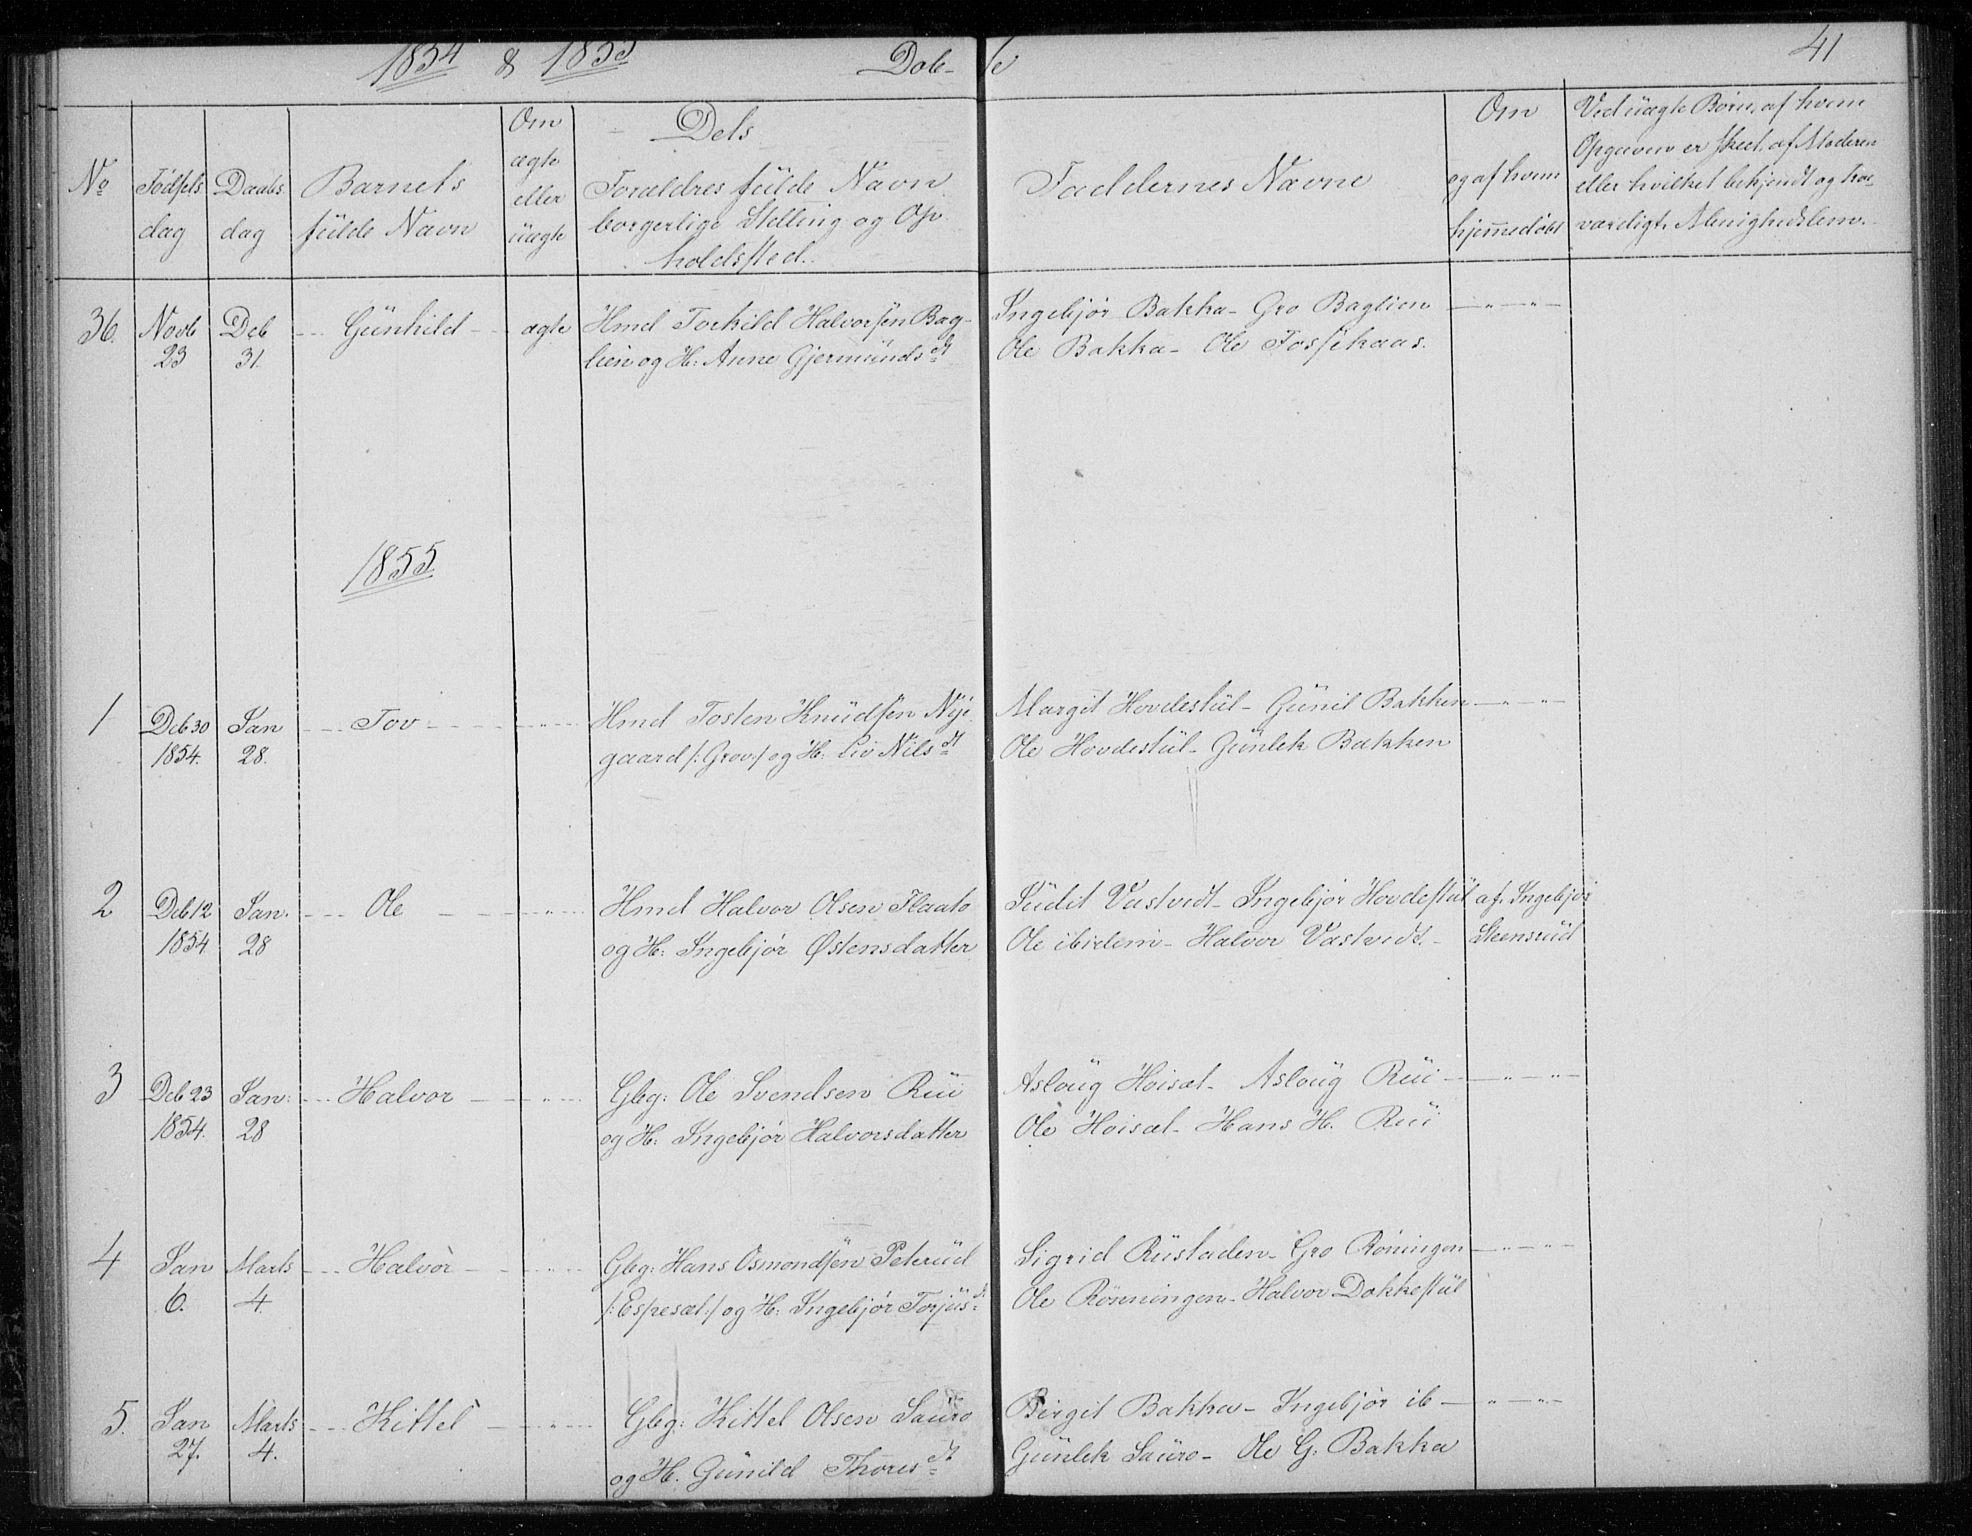 SAKO, Gransherad kirkebøker, F/Fb/L0003: Ministerialbok nr. II 3, 1844-1859, s. 41